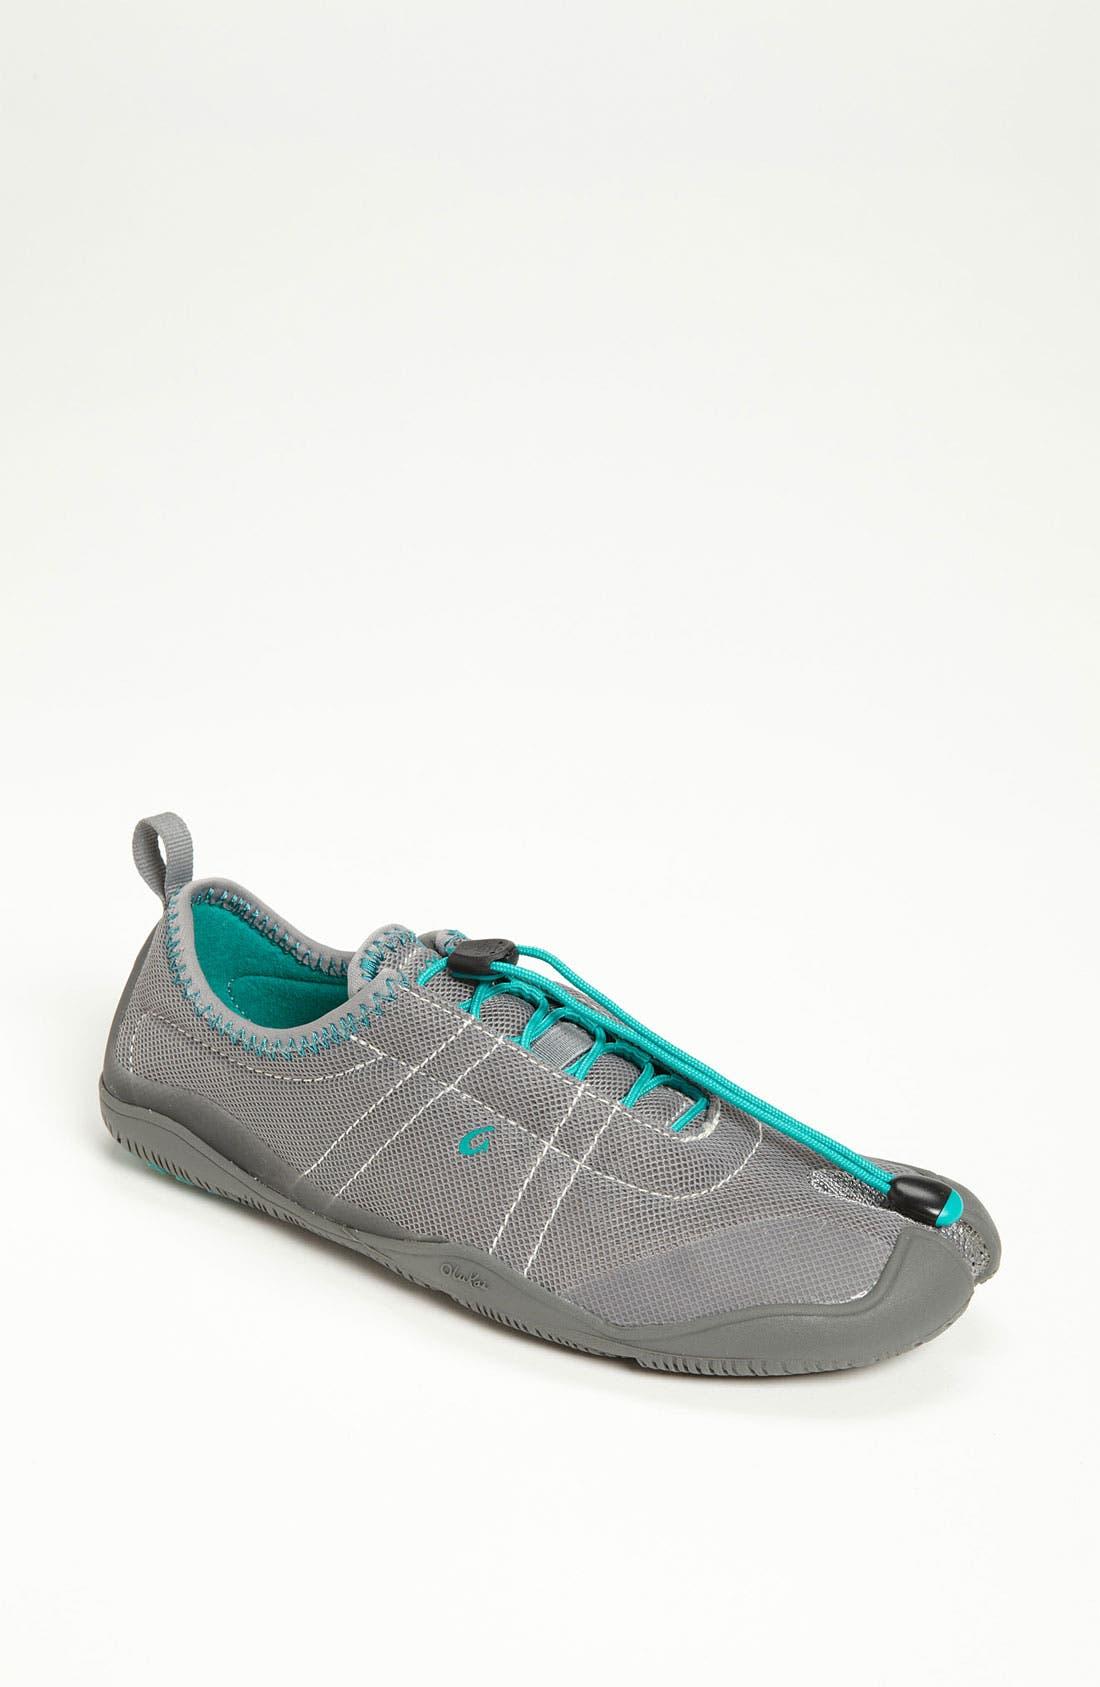 Main Image - OluKai 'Maliko' Sneaker (Women)